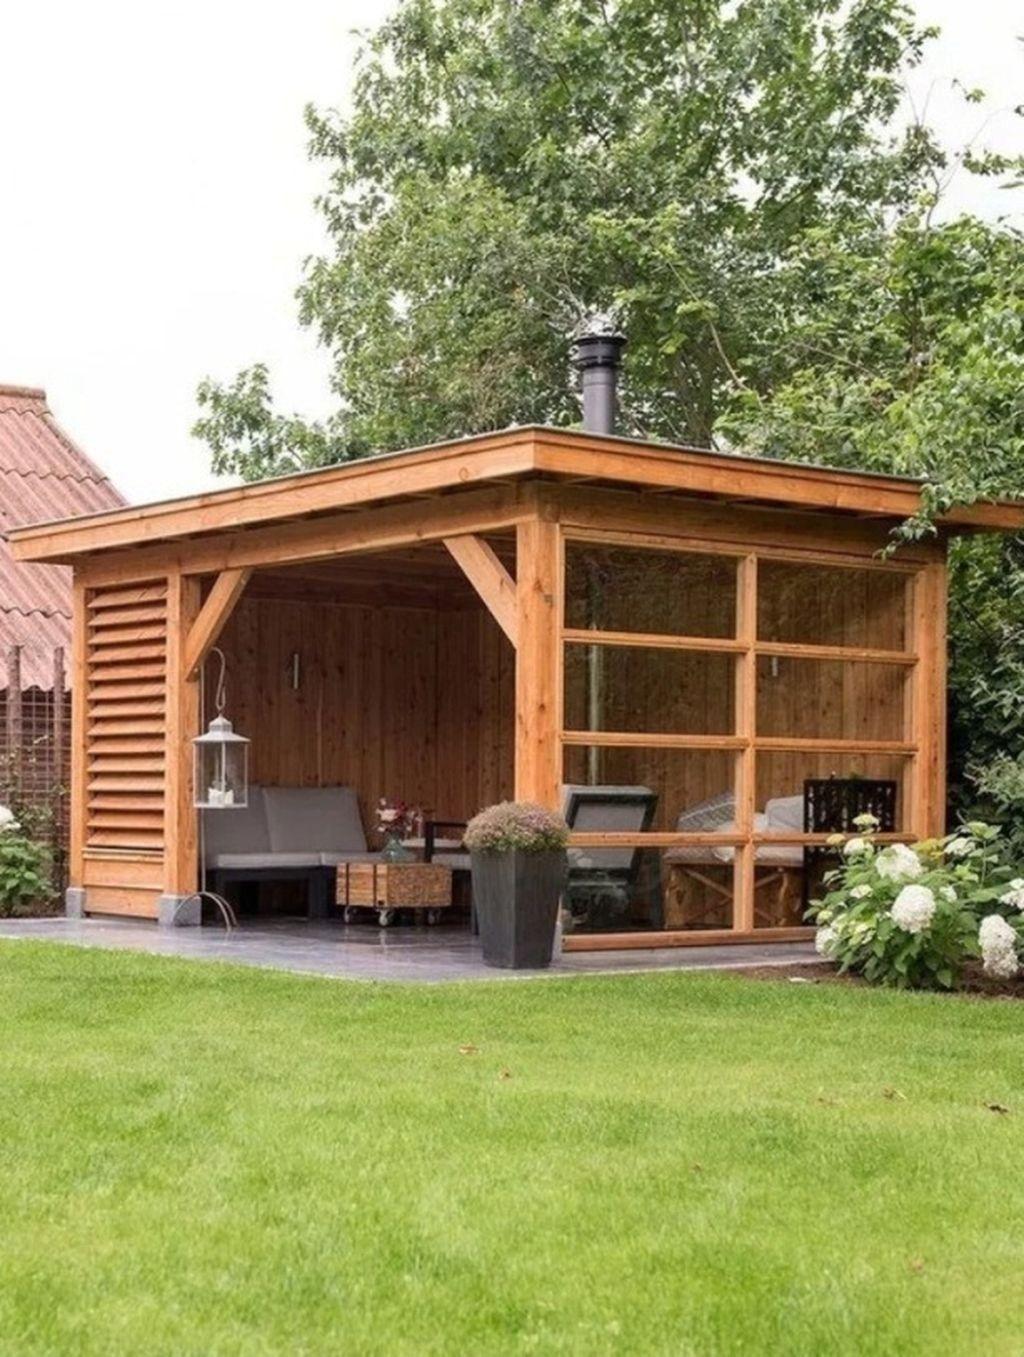 78 Luxury Backyard Storage Shed Design Ideas Backyardstorage In 2020 Backyard Patio Backyard Sheds Backyard Storage Sheds